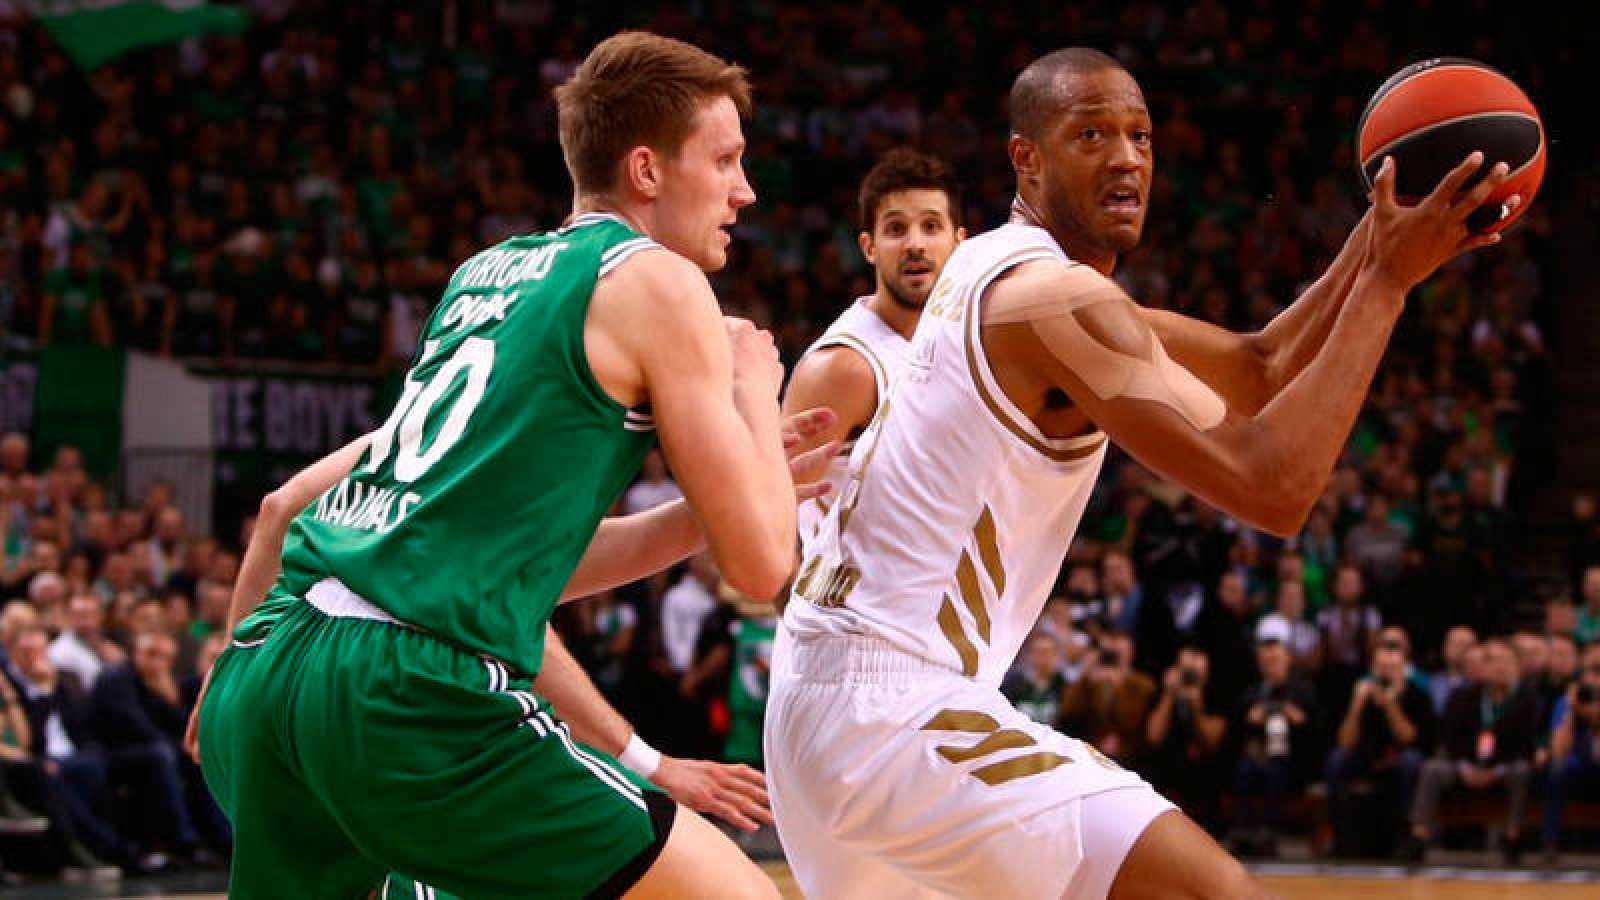 El Madrid cae en Kaunas